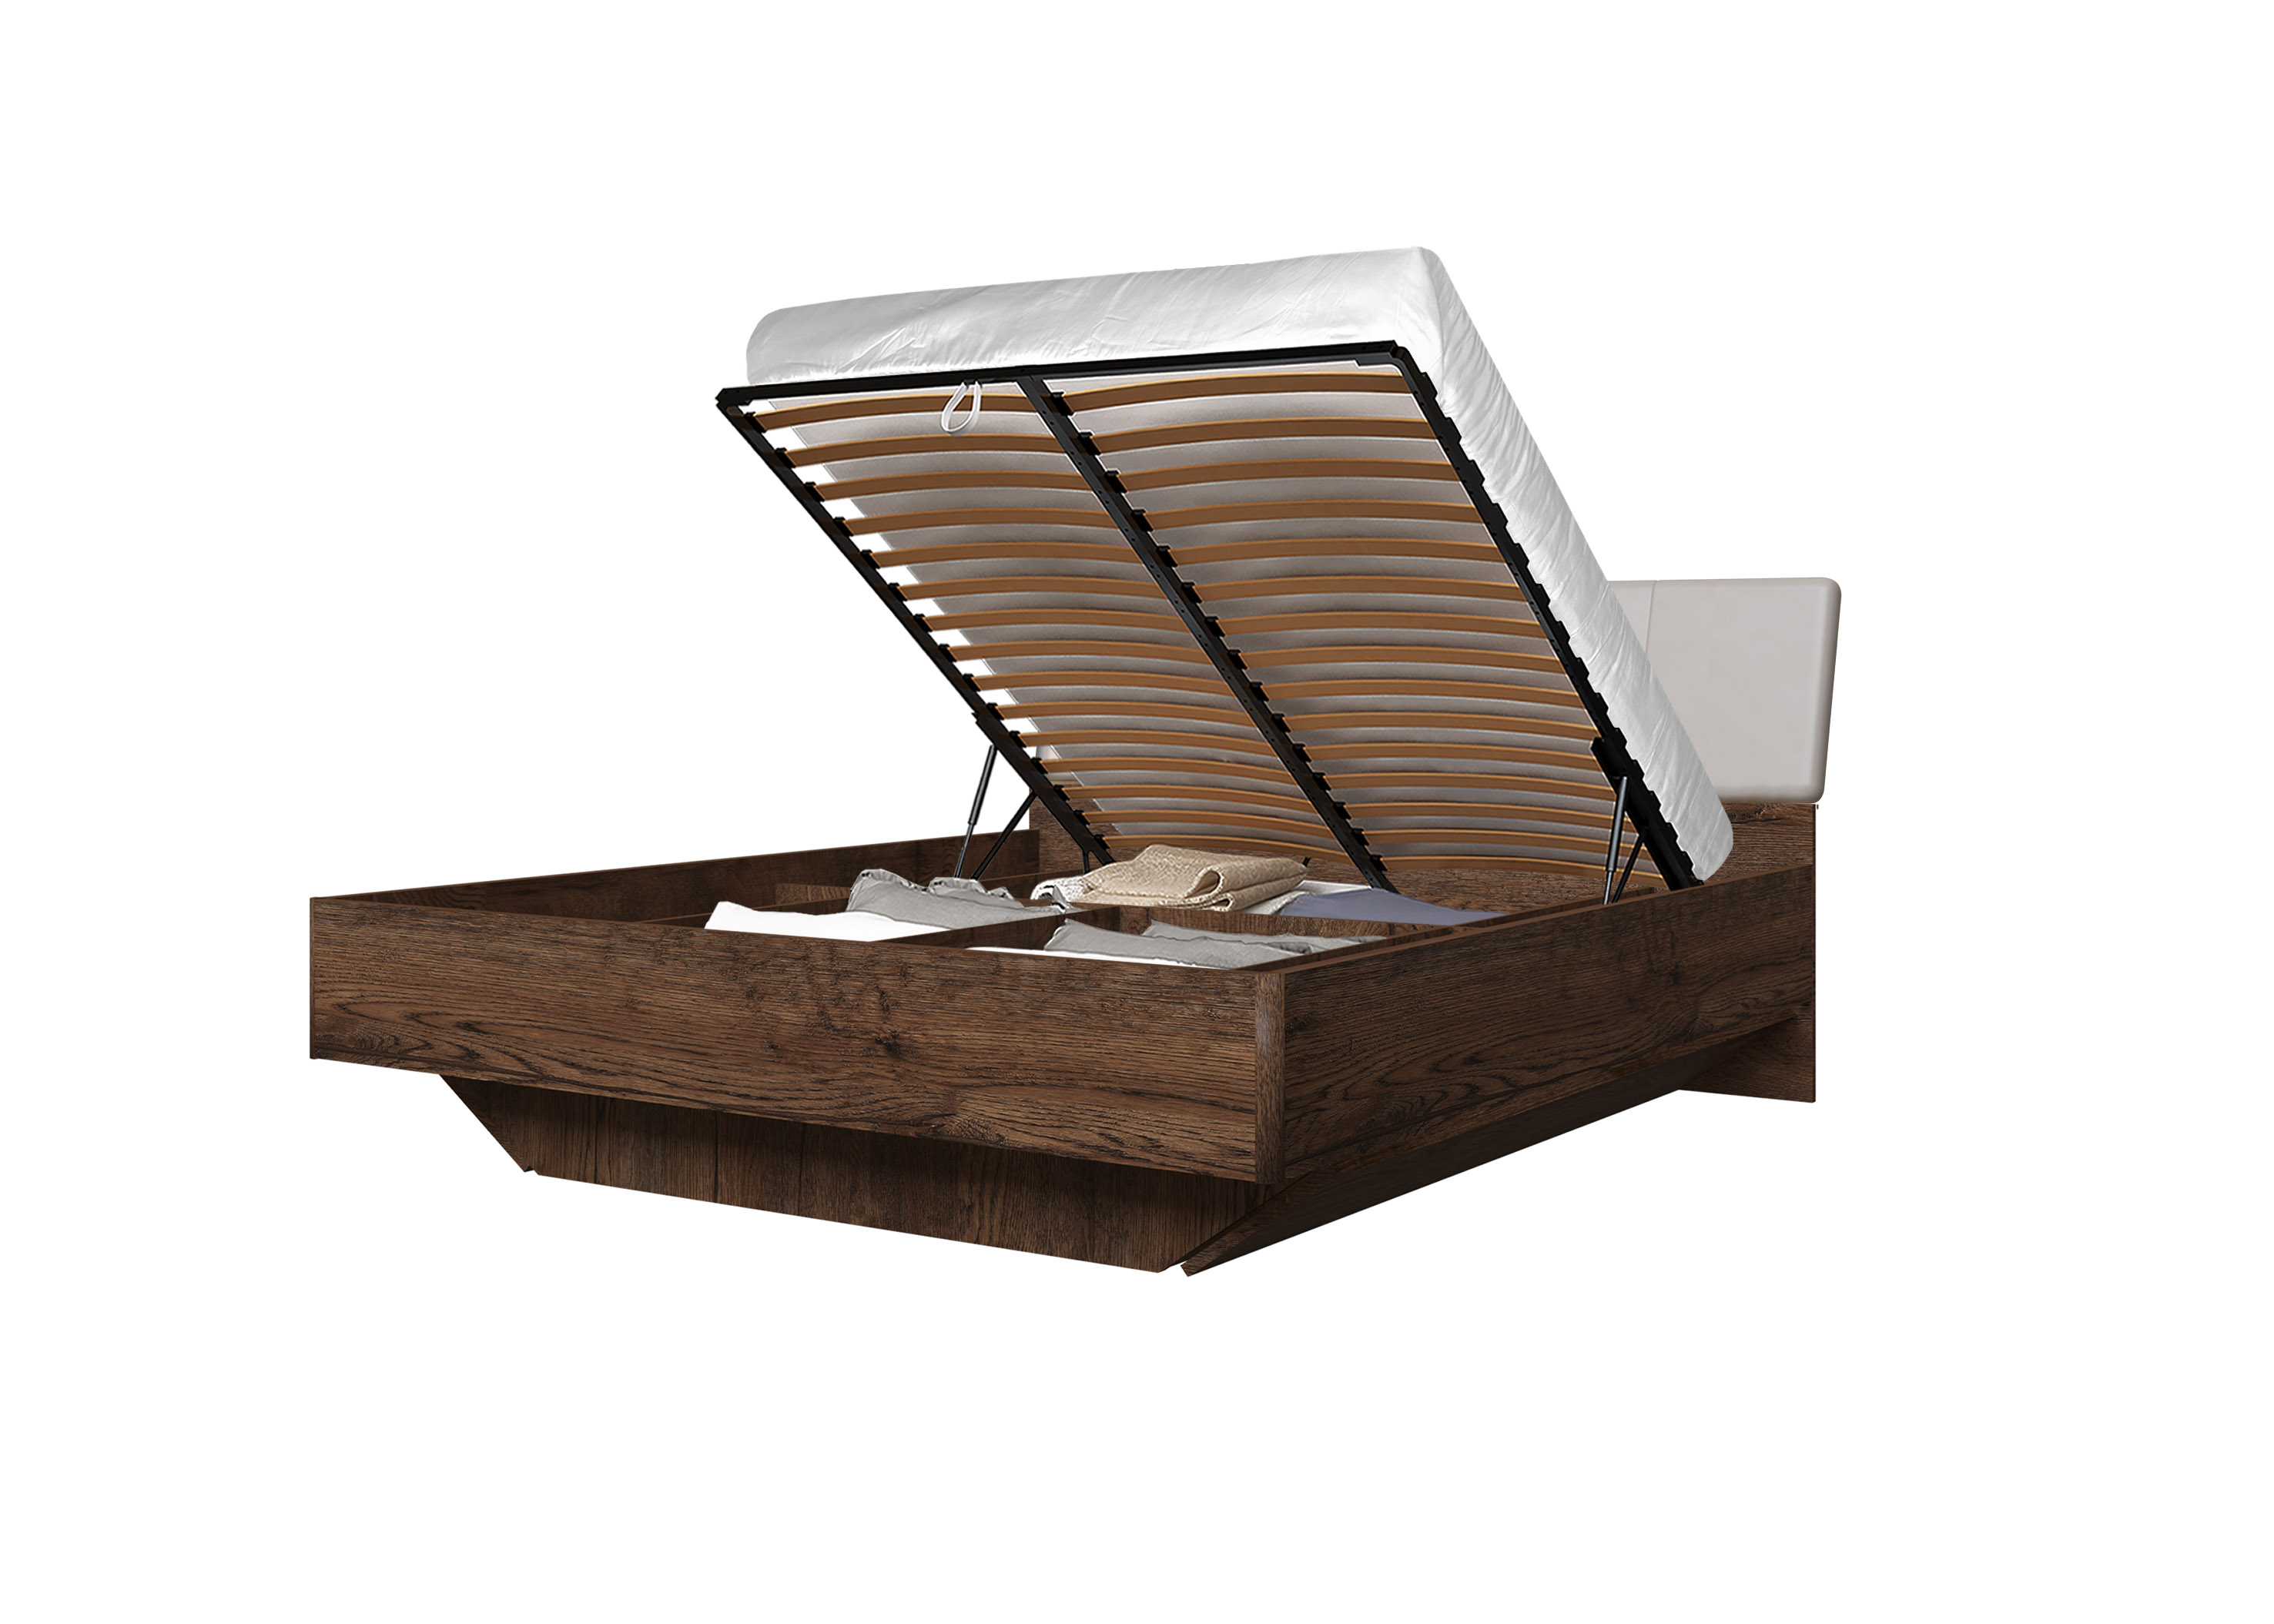 Doppelbett Toskana 180x200 in Dunkle Eiche/Cappuccino inkl. Bettkasten